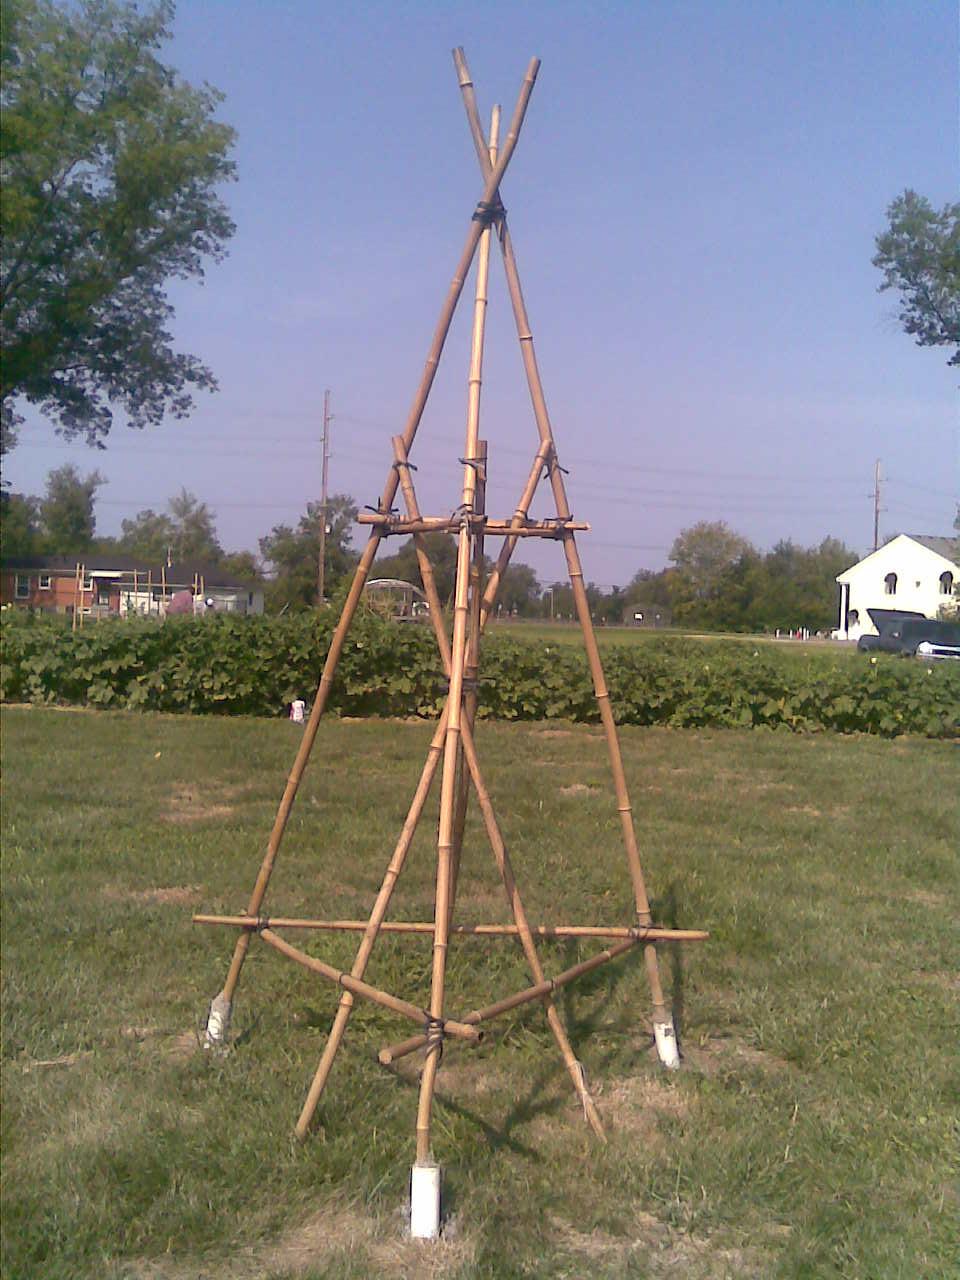 MKAmos Community Garden Art in Newburg Summer 2012